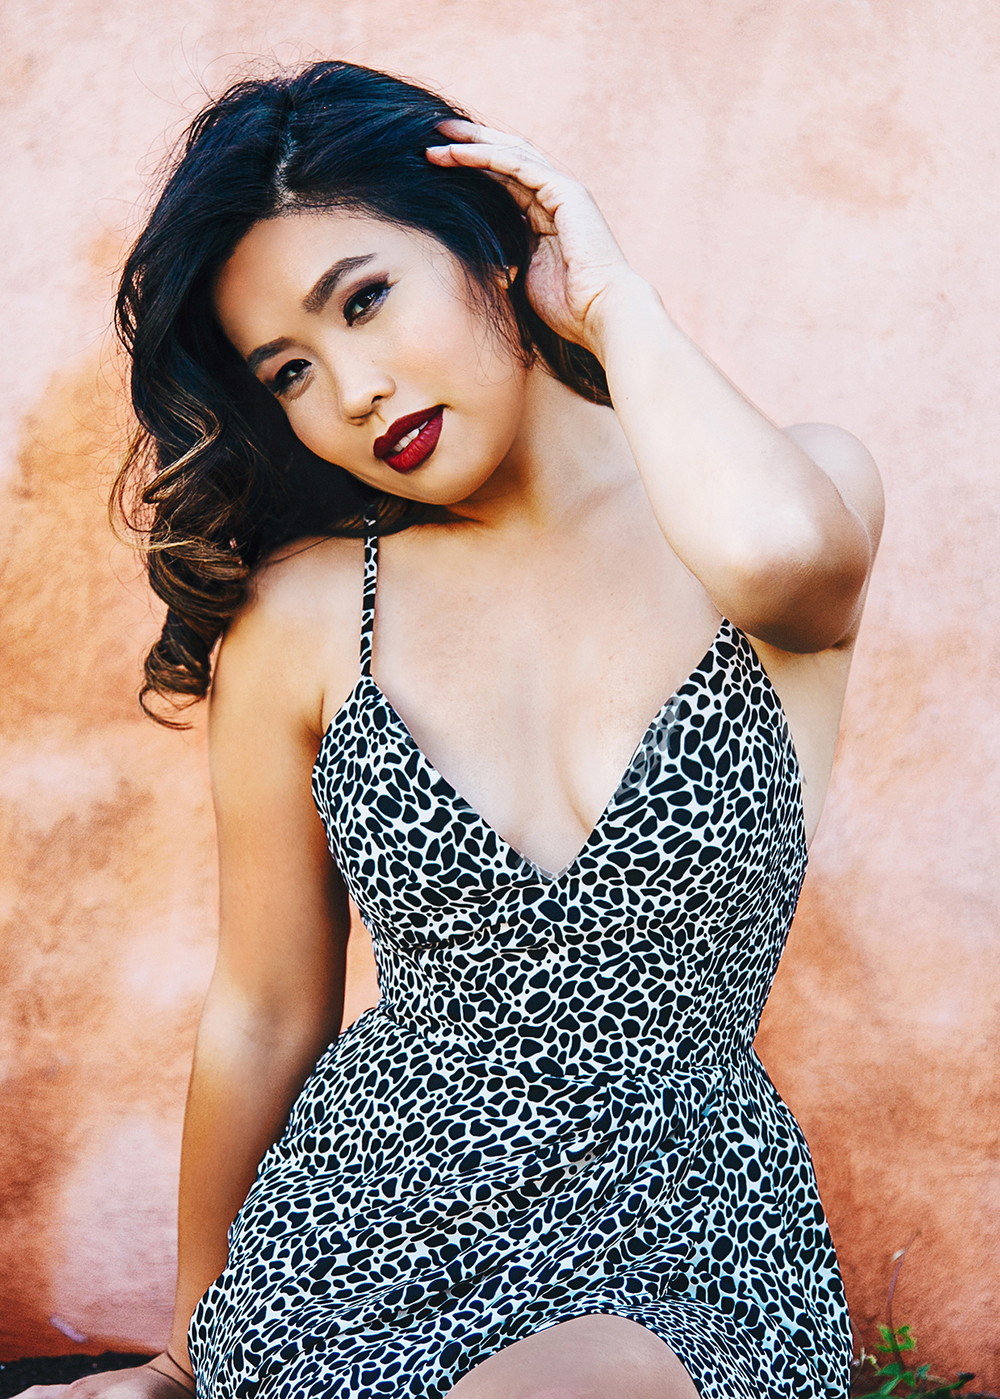 Evie Lynn x Diana Nguyen-01.jpg